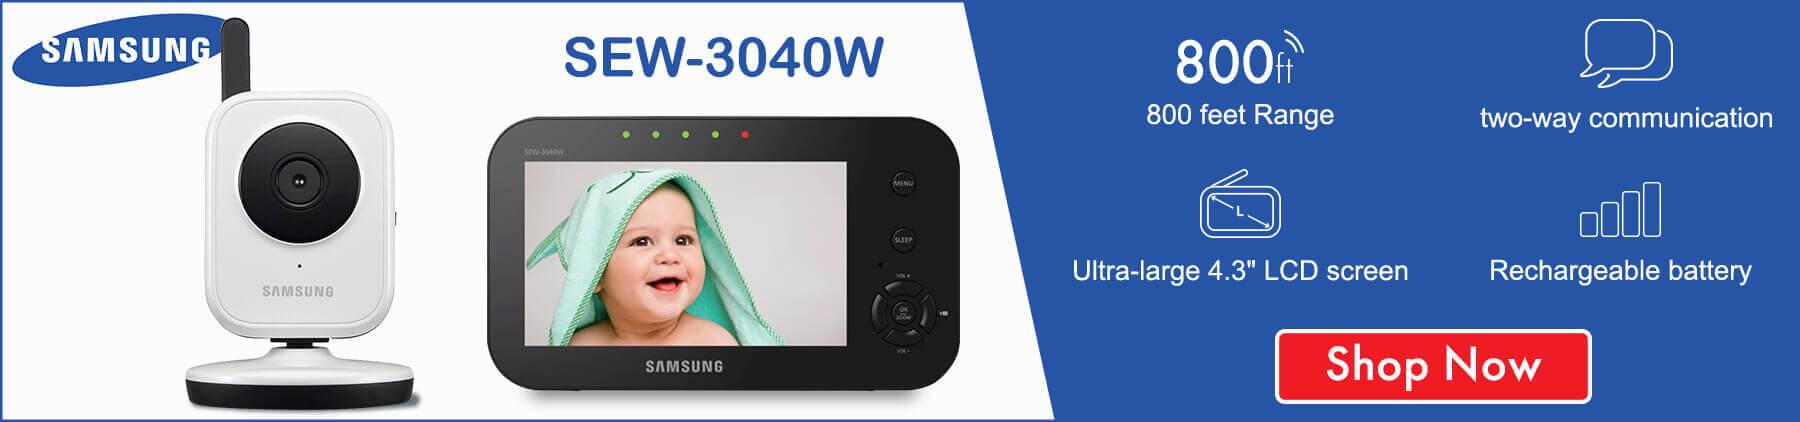 Samsung SEW-3040